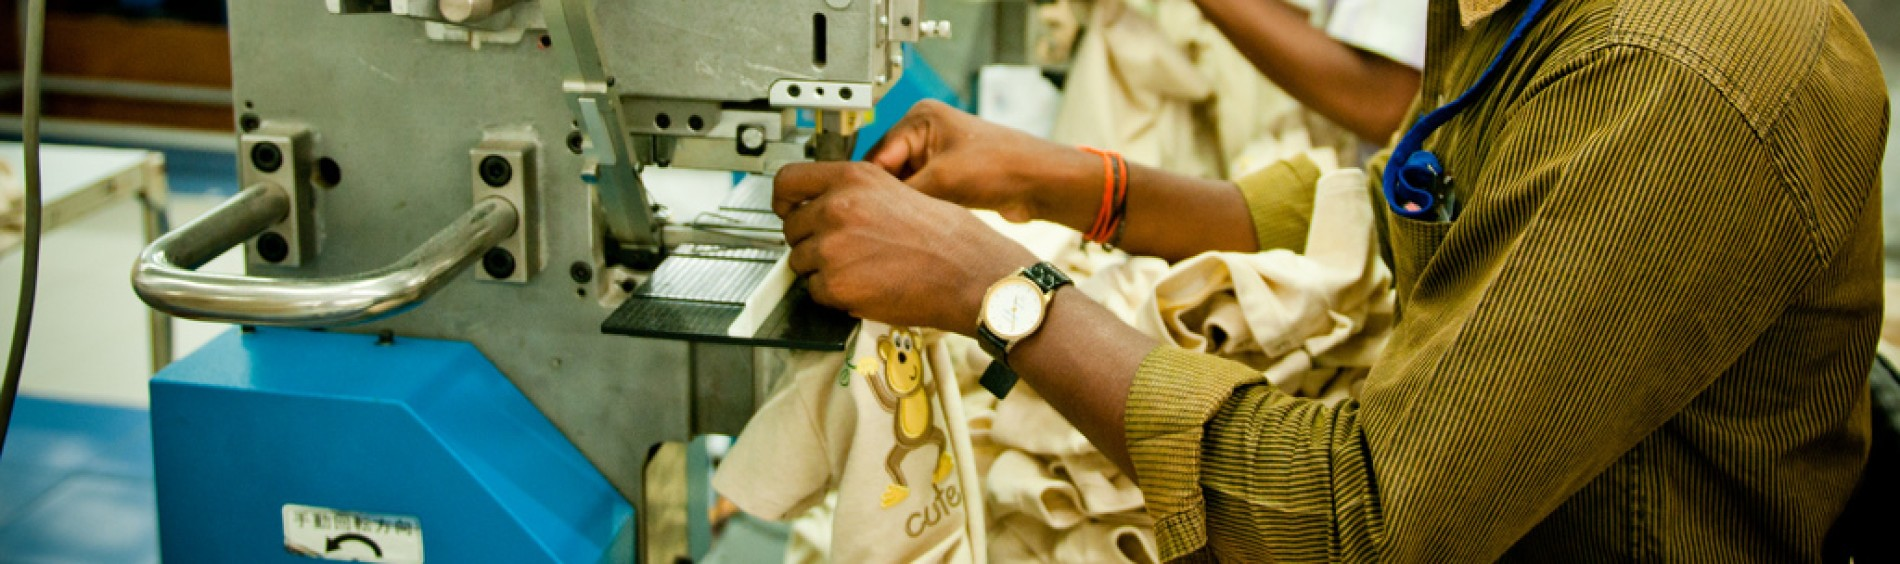 Man working in factory. Homme travaillant dans une usine.